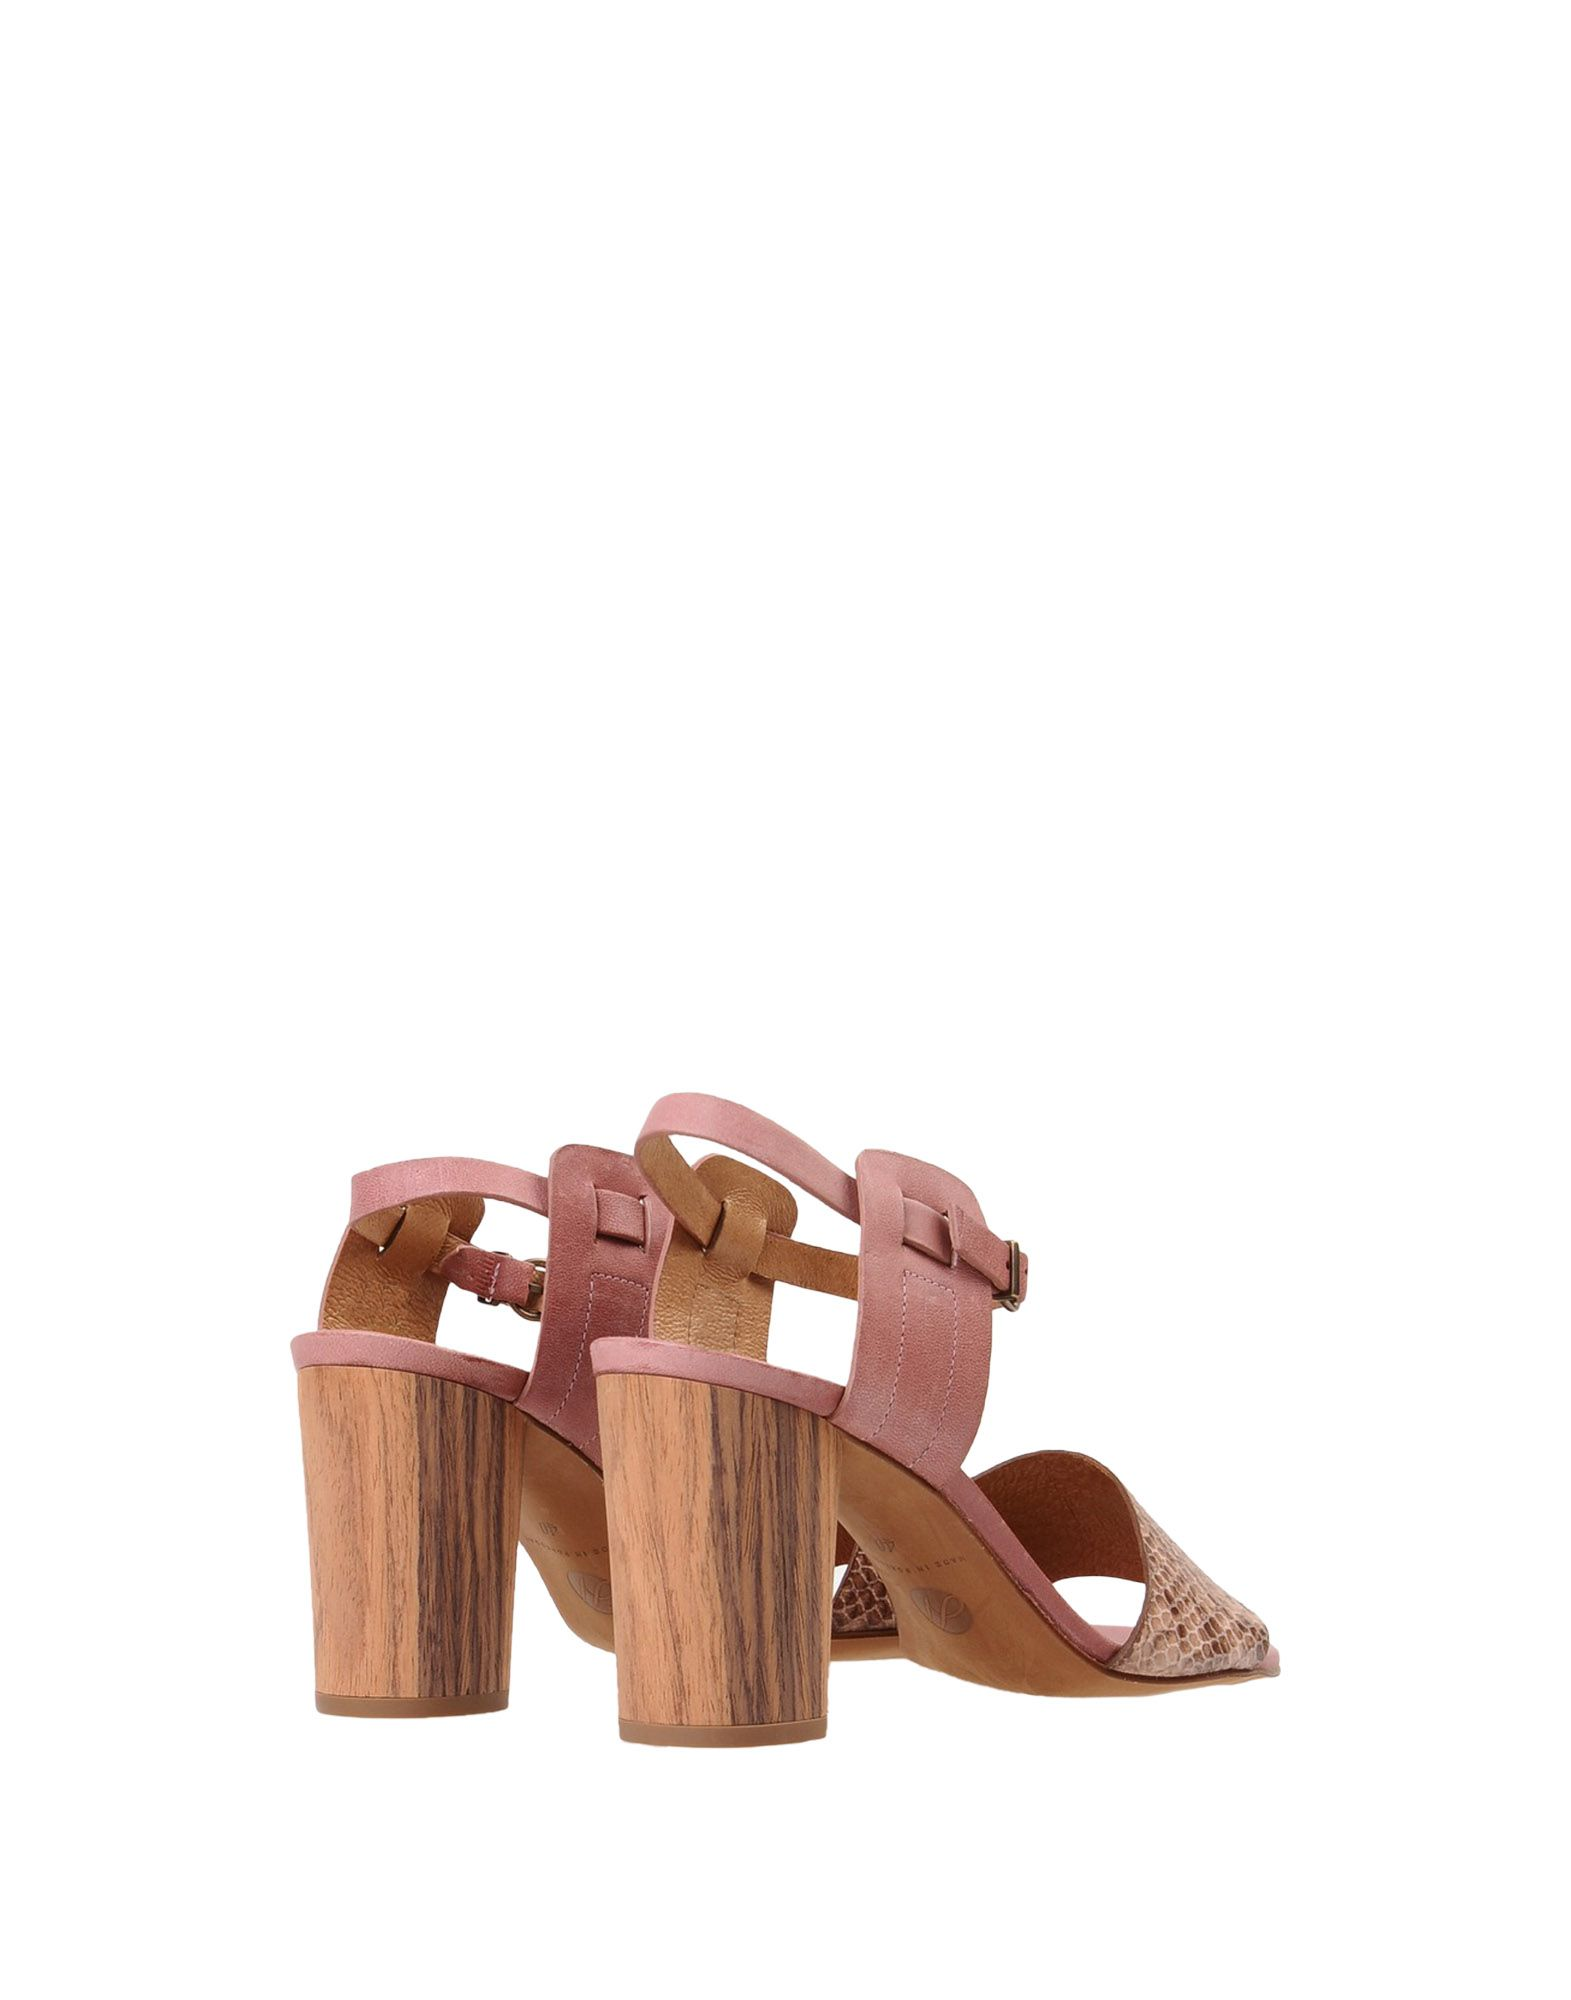 H Silia By Hudson Silia H  11458118RV Gute Qualität beliebte Schuhe d8c3d8